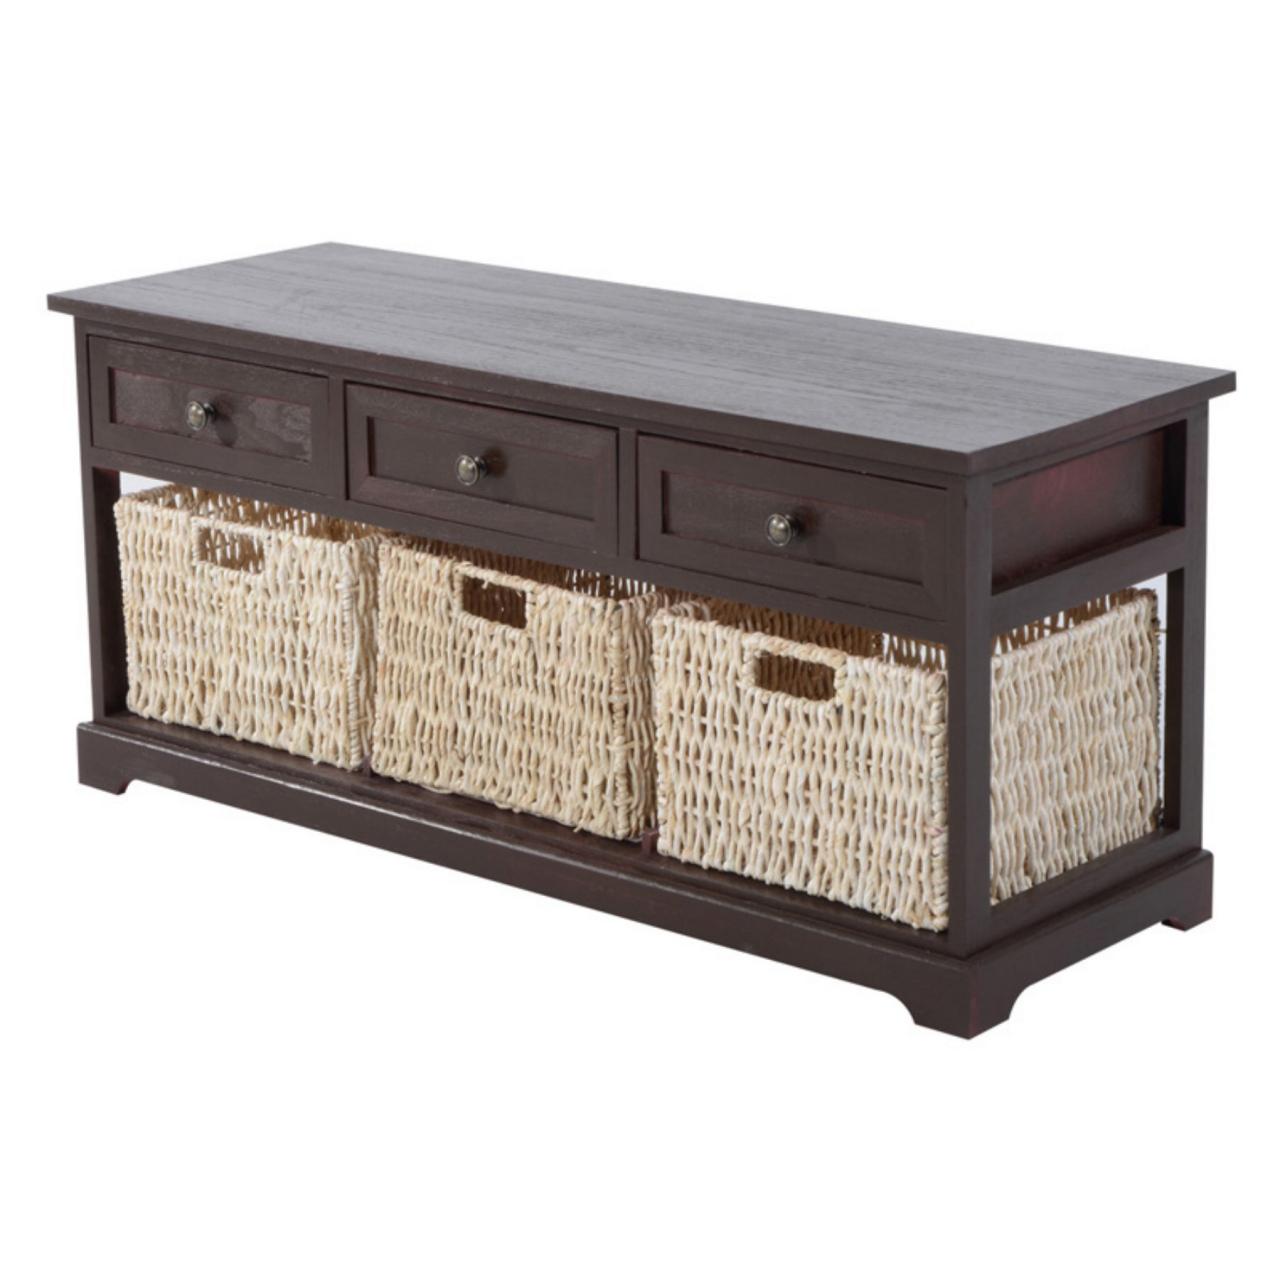 bench with storage baskets hom 40 in wicker basket storage bench products durch bench with storage baskets